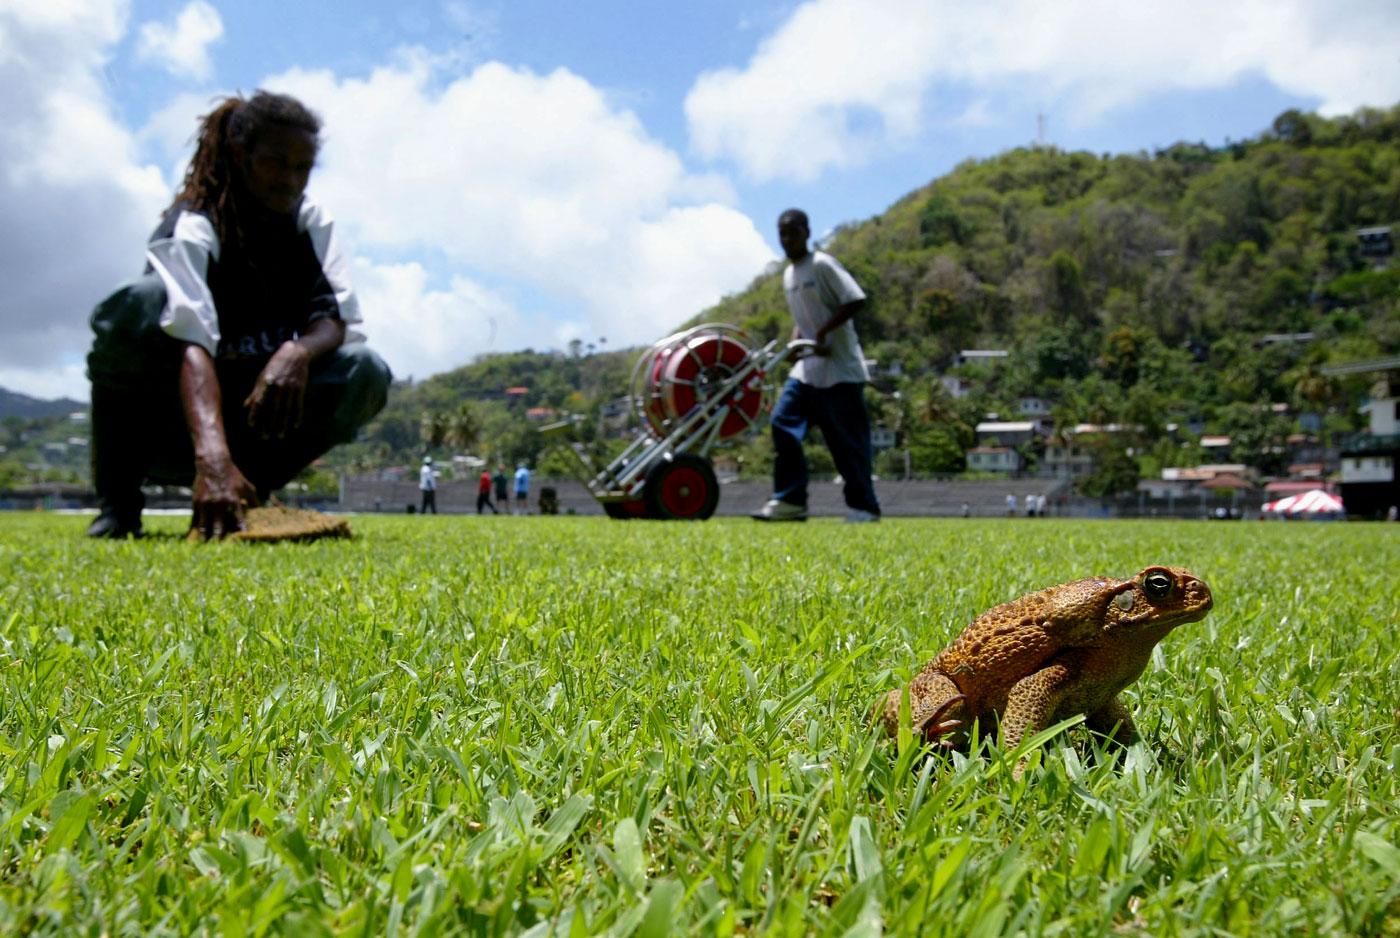 Blogs Clickbait Animals On The Cricket Field Cricket